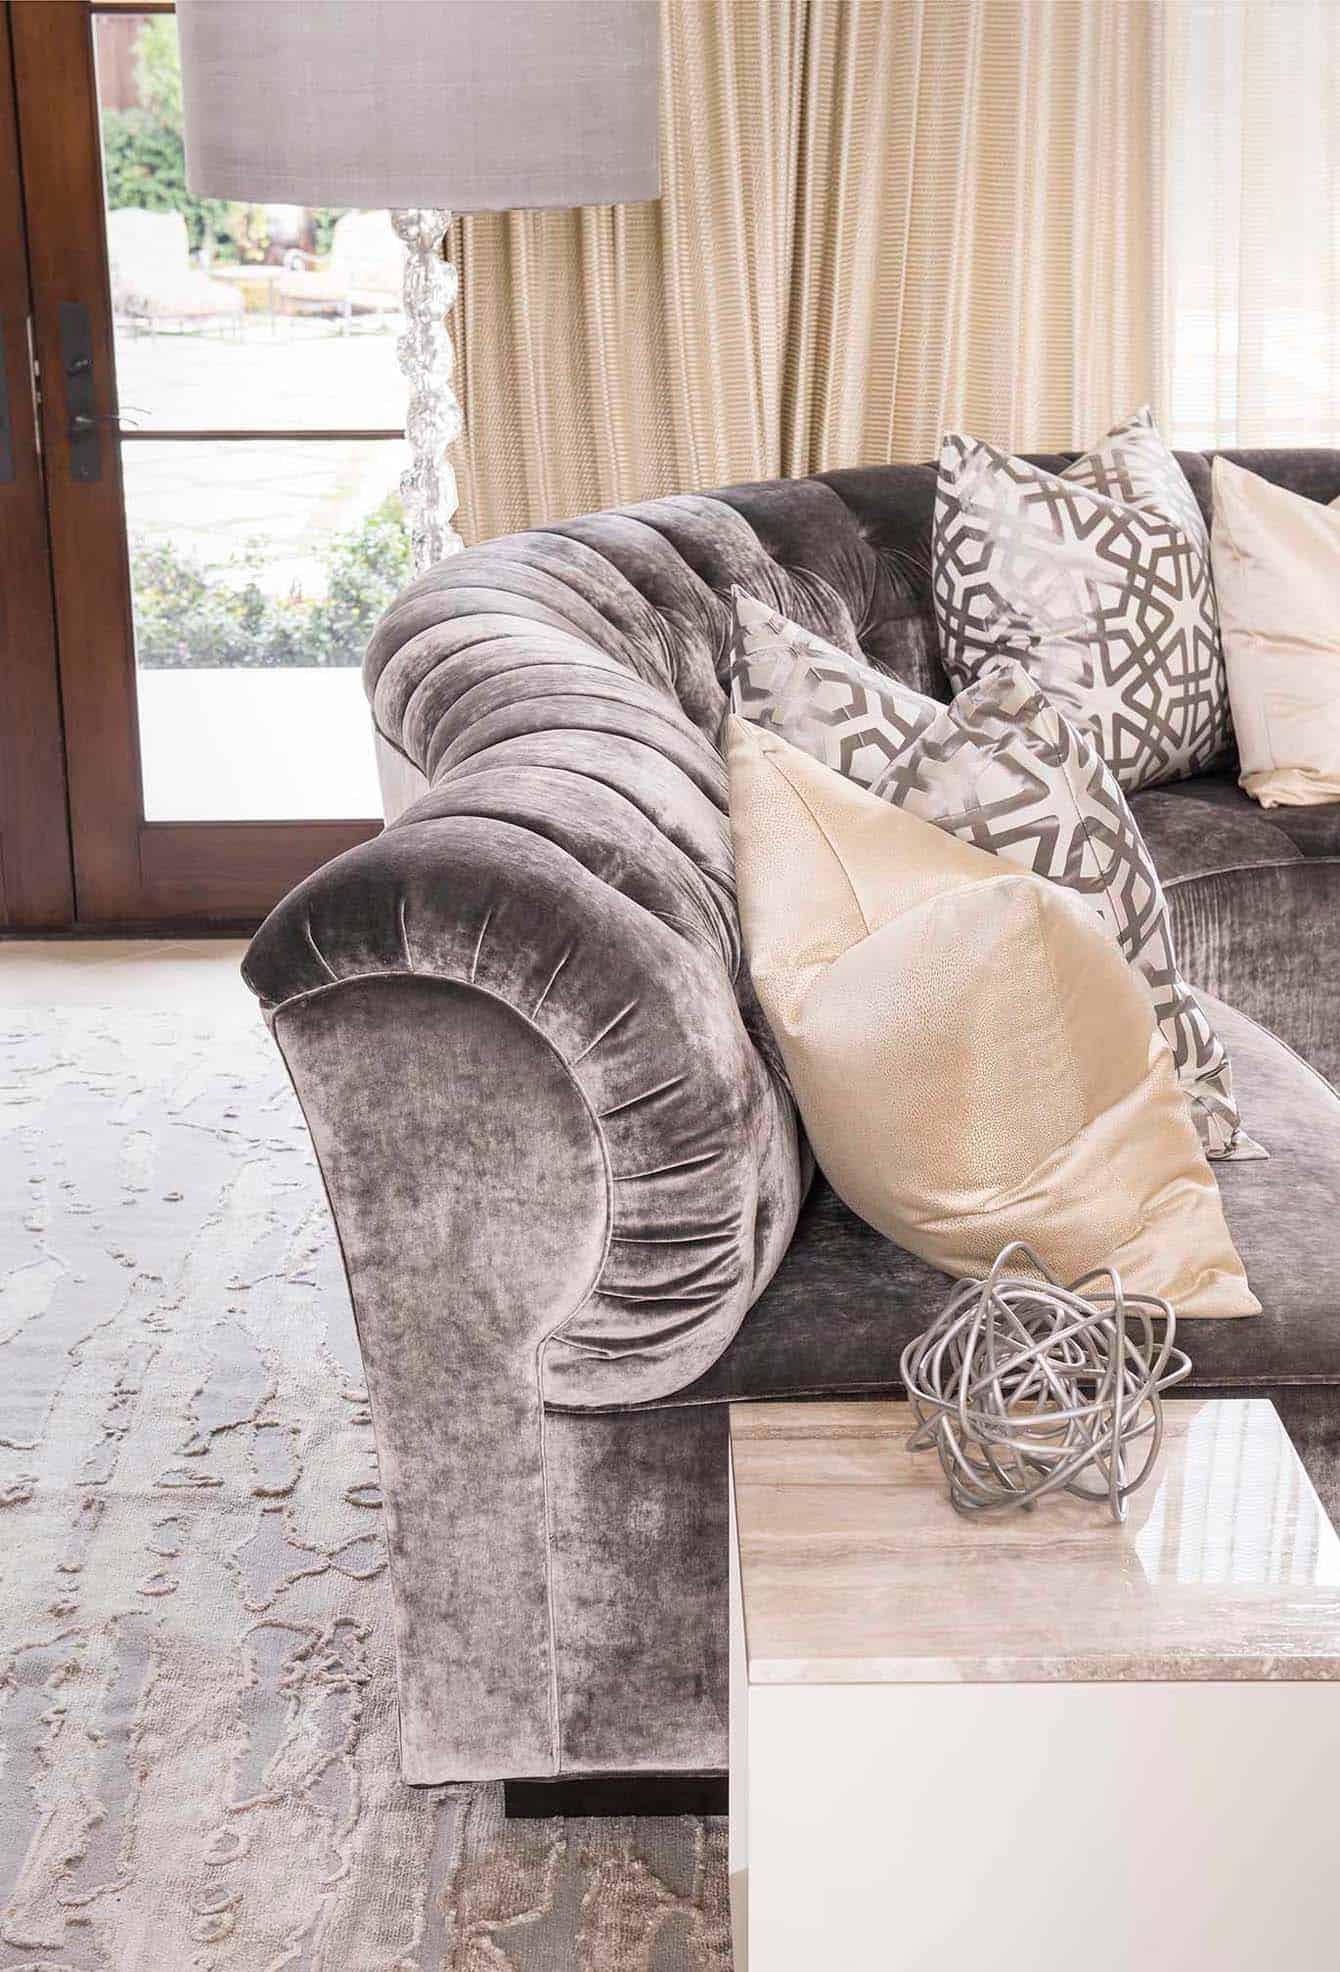 Contemporary Style Home-Dallas Design Group-07-1 Kindesign